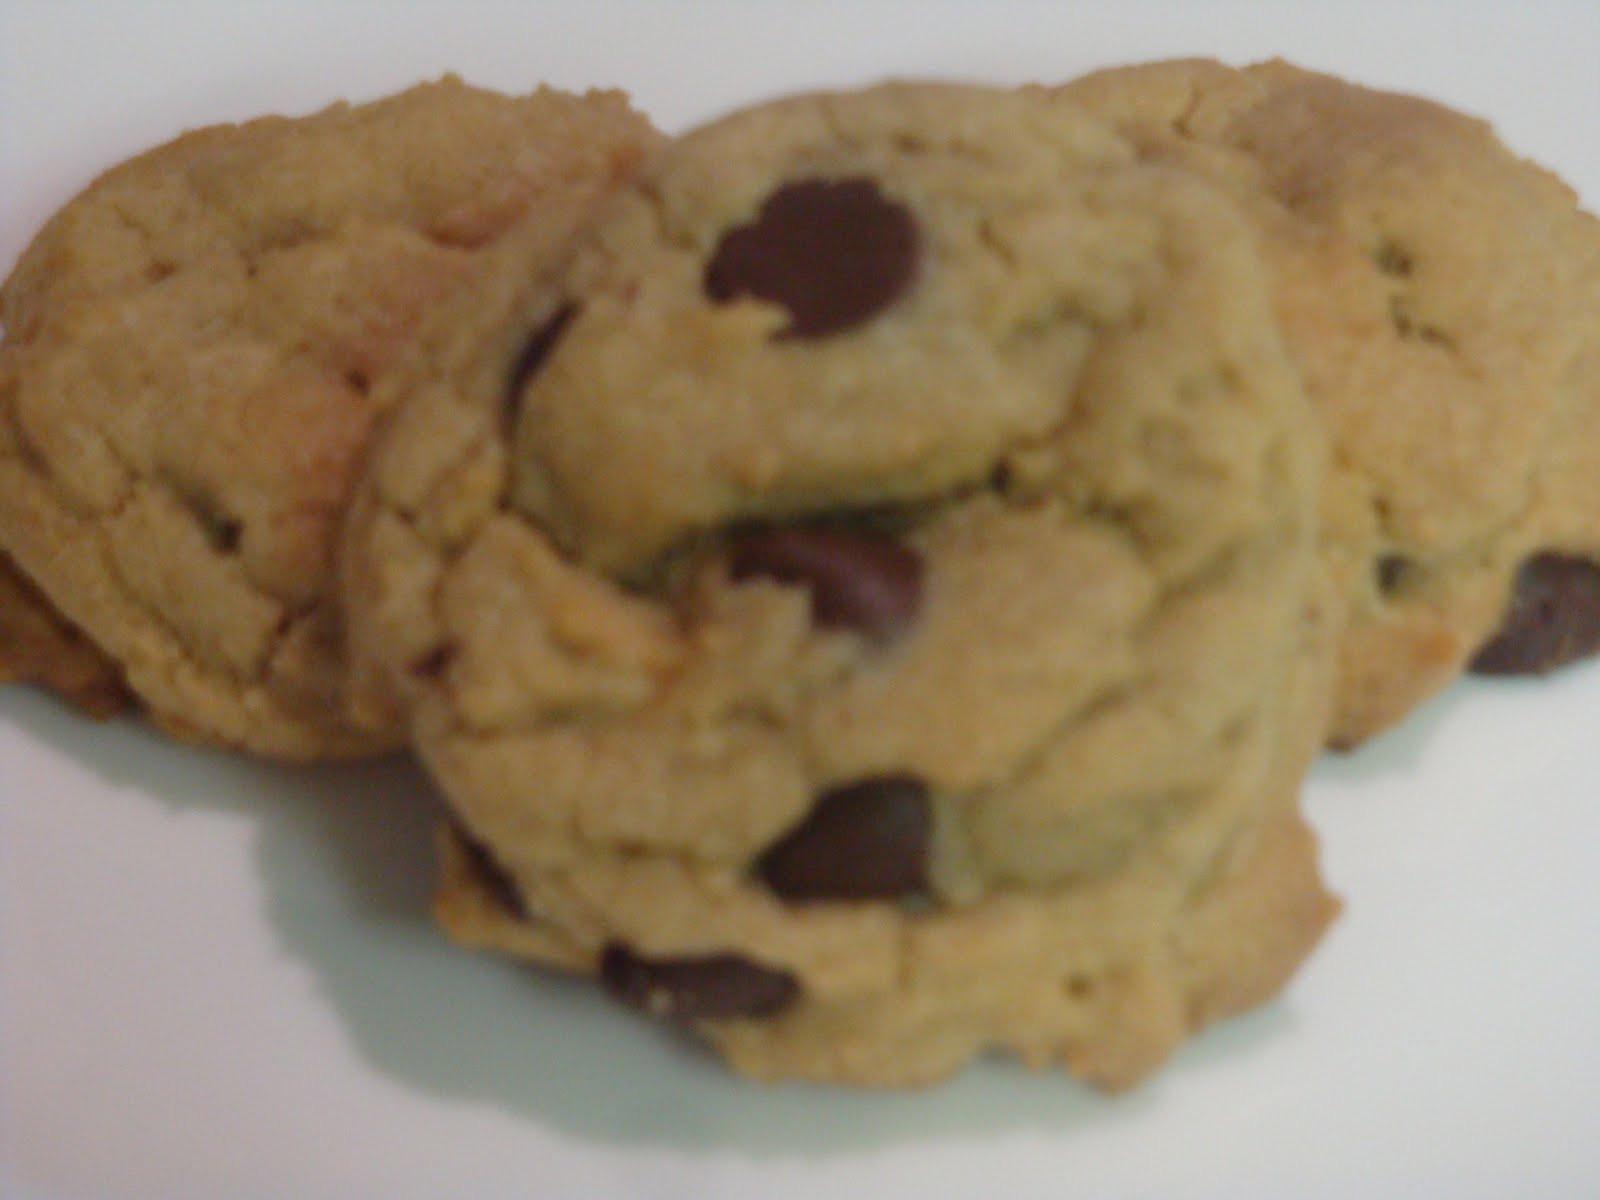 Award Winning Chocolate Chip Cookies  simply made with love Award Winning Chocolate Chip Cookies